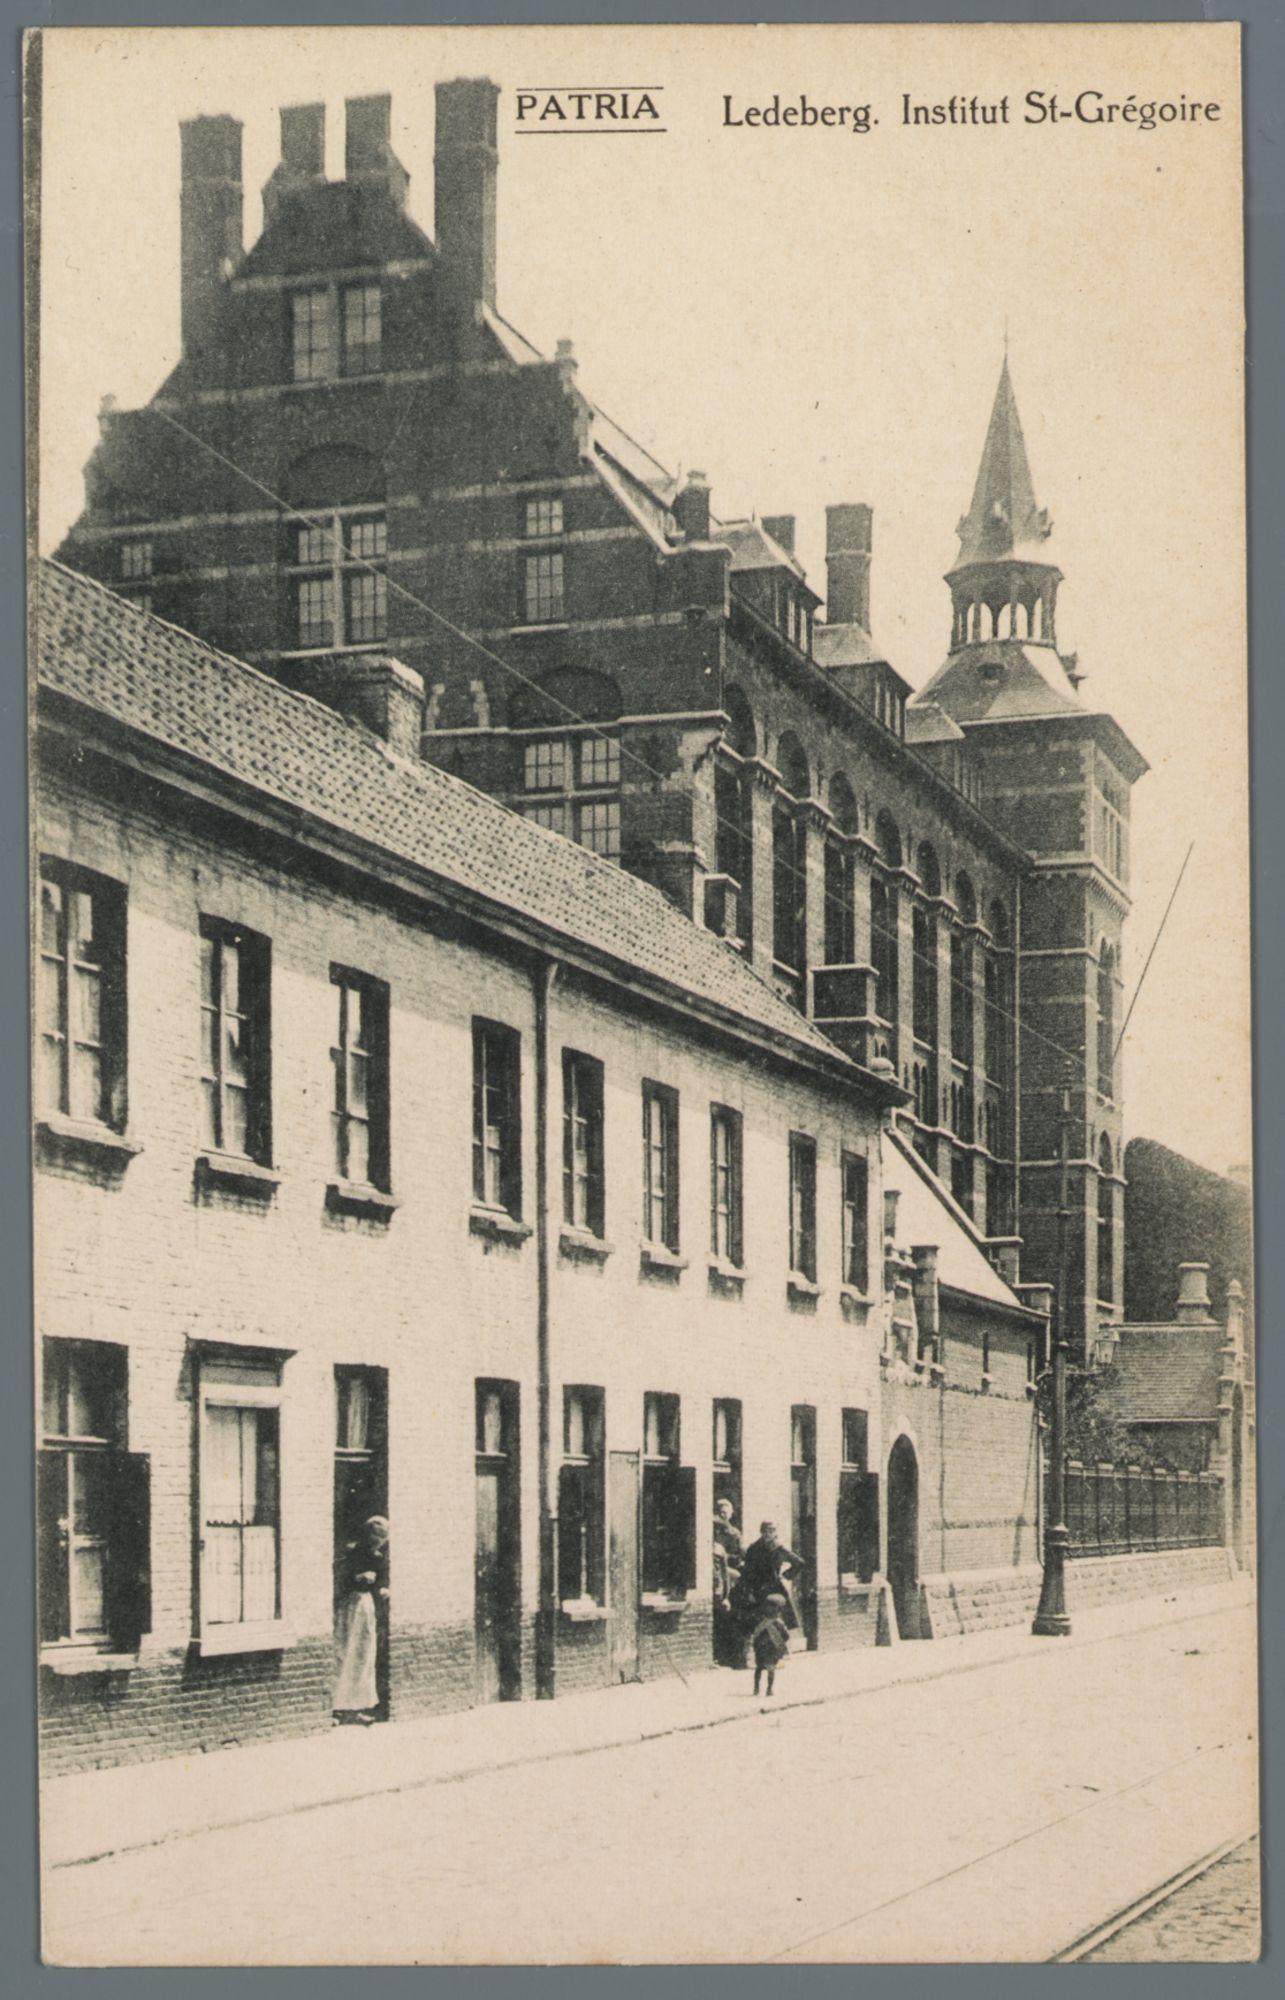 Ledeberg: Sint-Gregoriusinstituut (school)